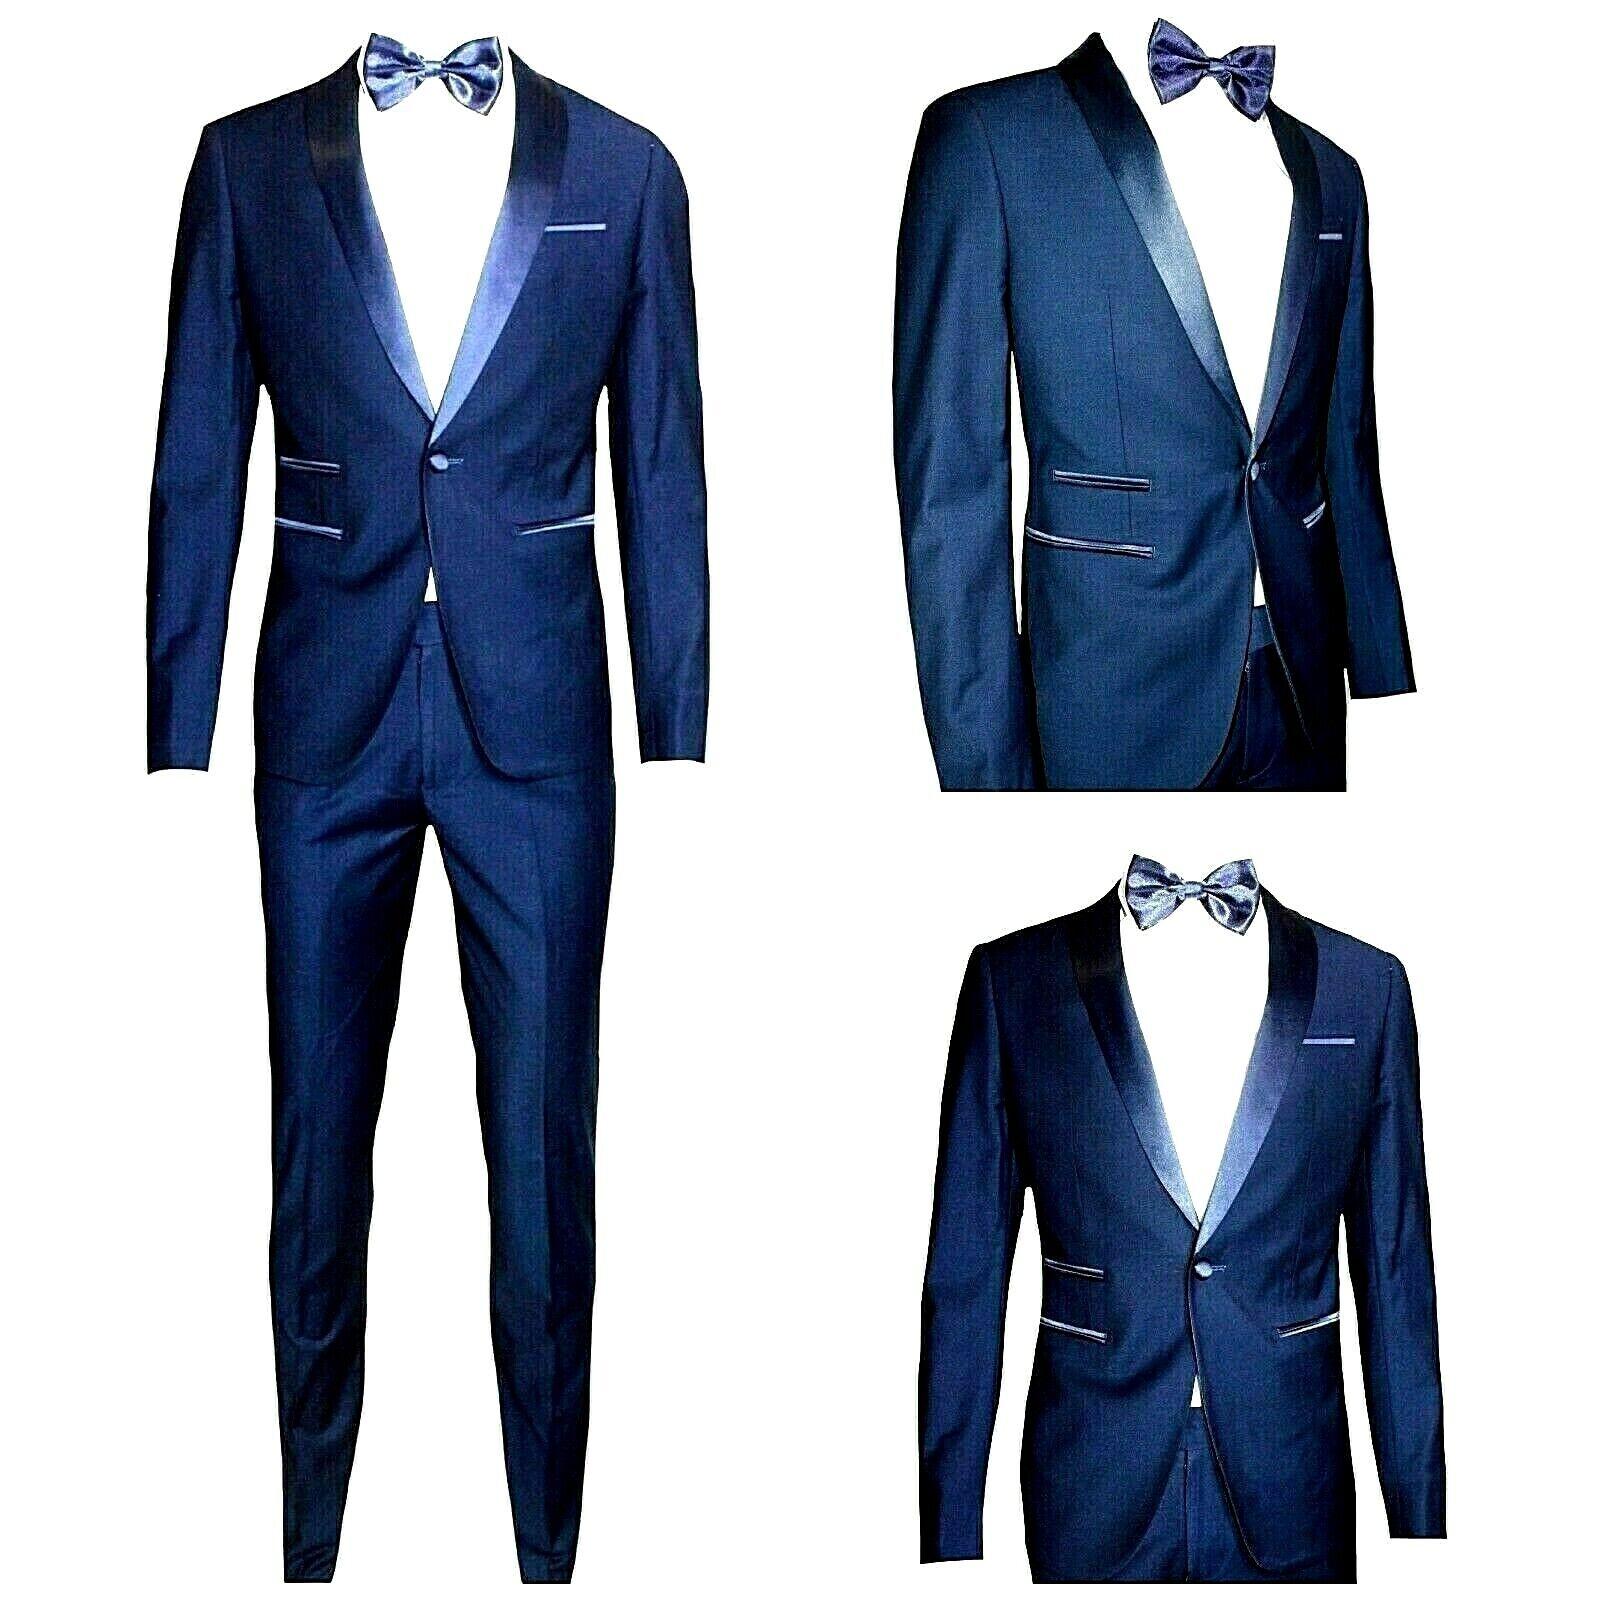 Smoking uomo SUPER SLIM blu abito misto viscosa/raso 44 46 48 50 52 54 56 58 60